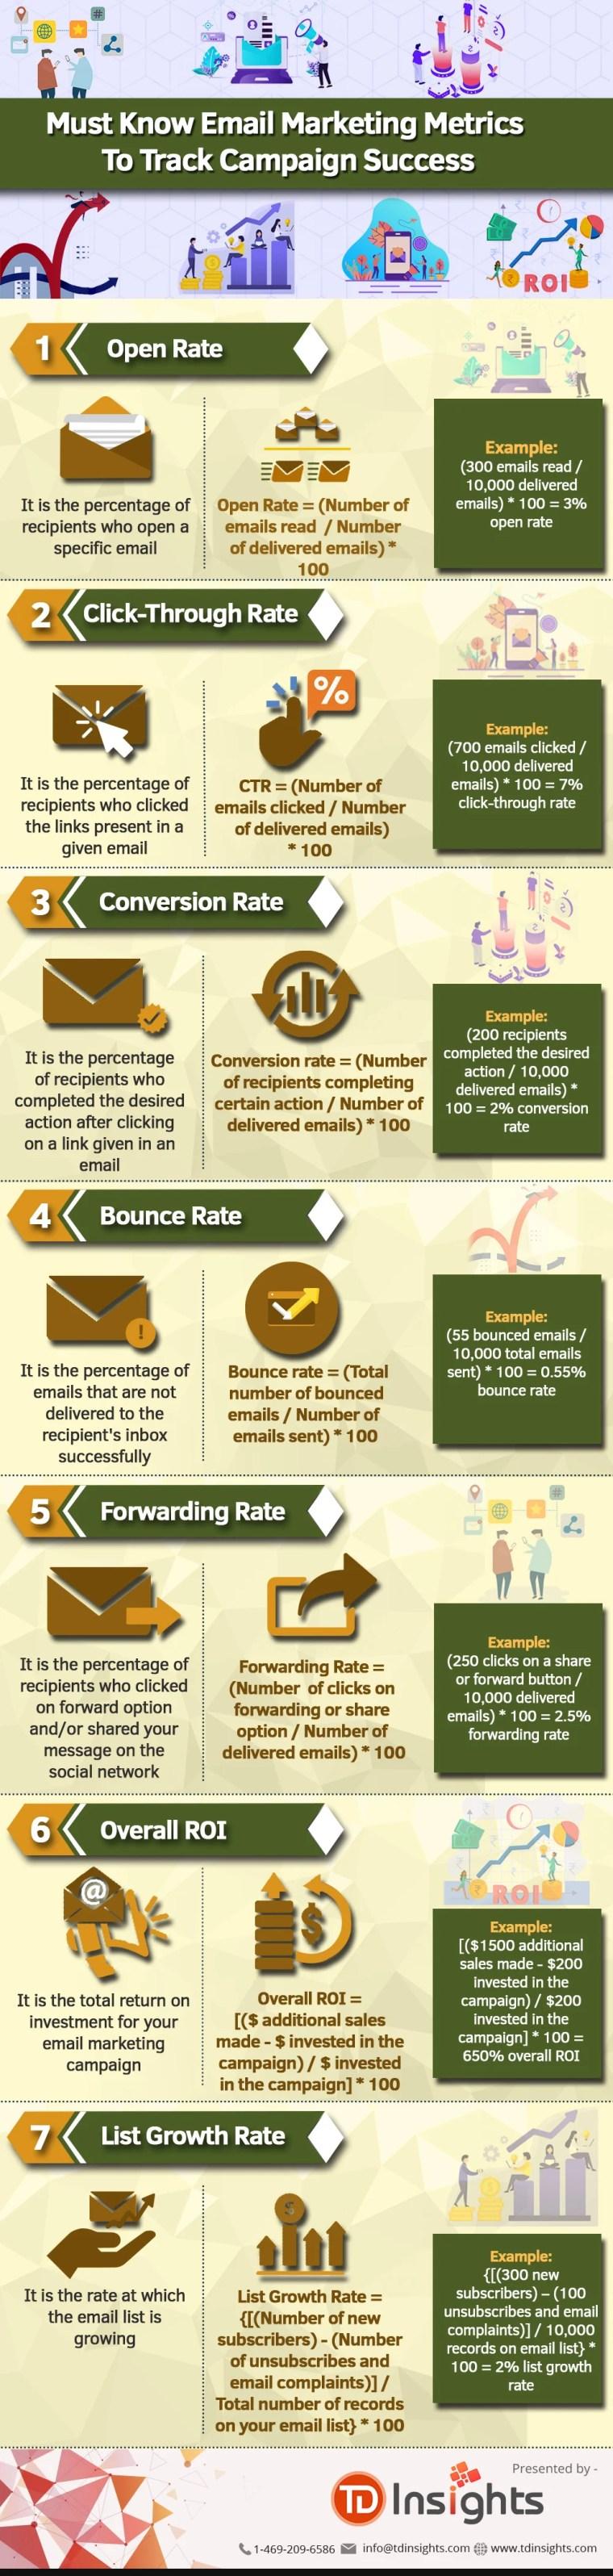 Email marketing metrics infographic